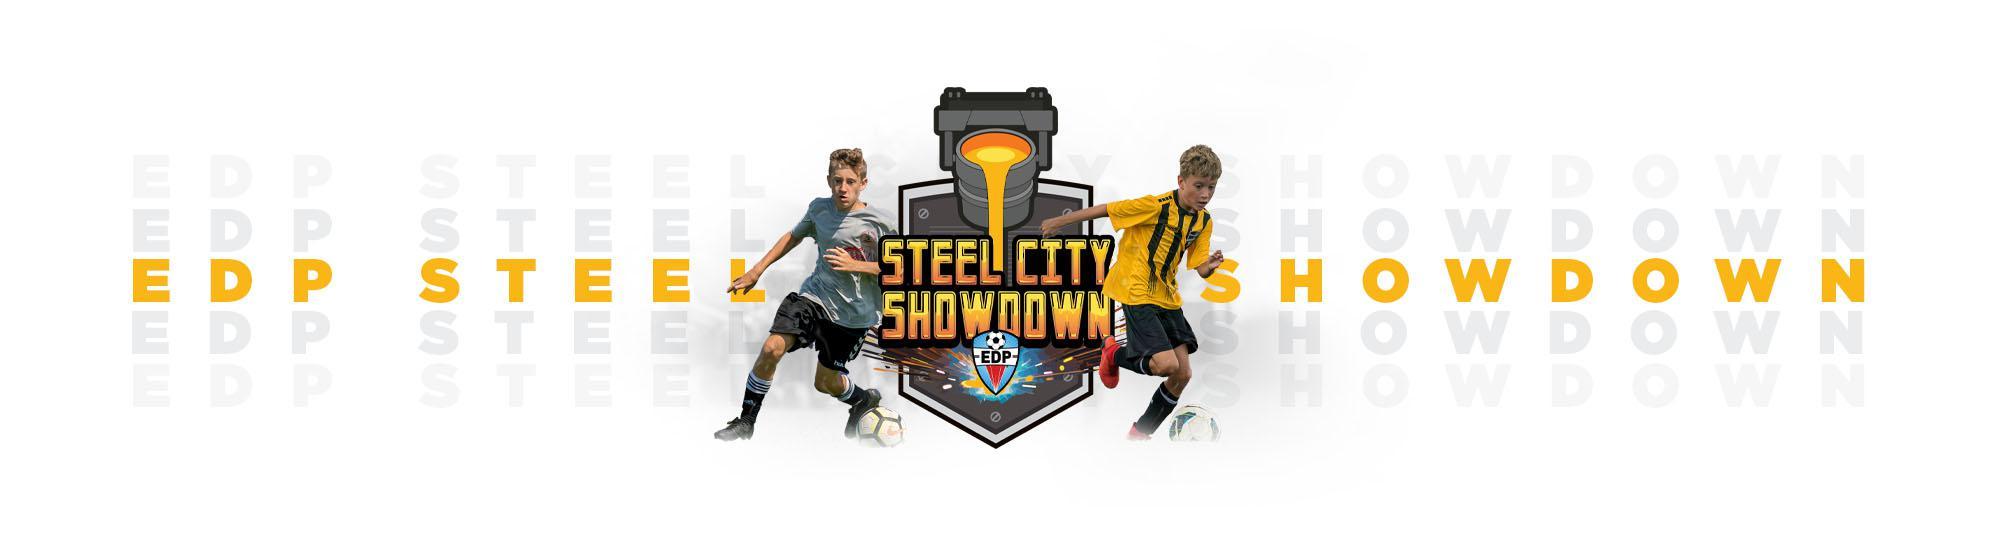 EDP Steel City Showdown